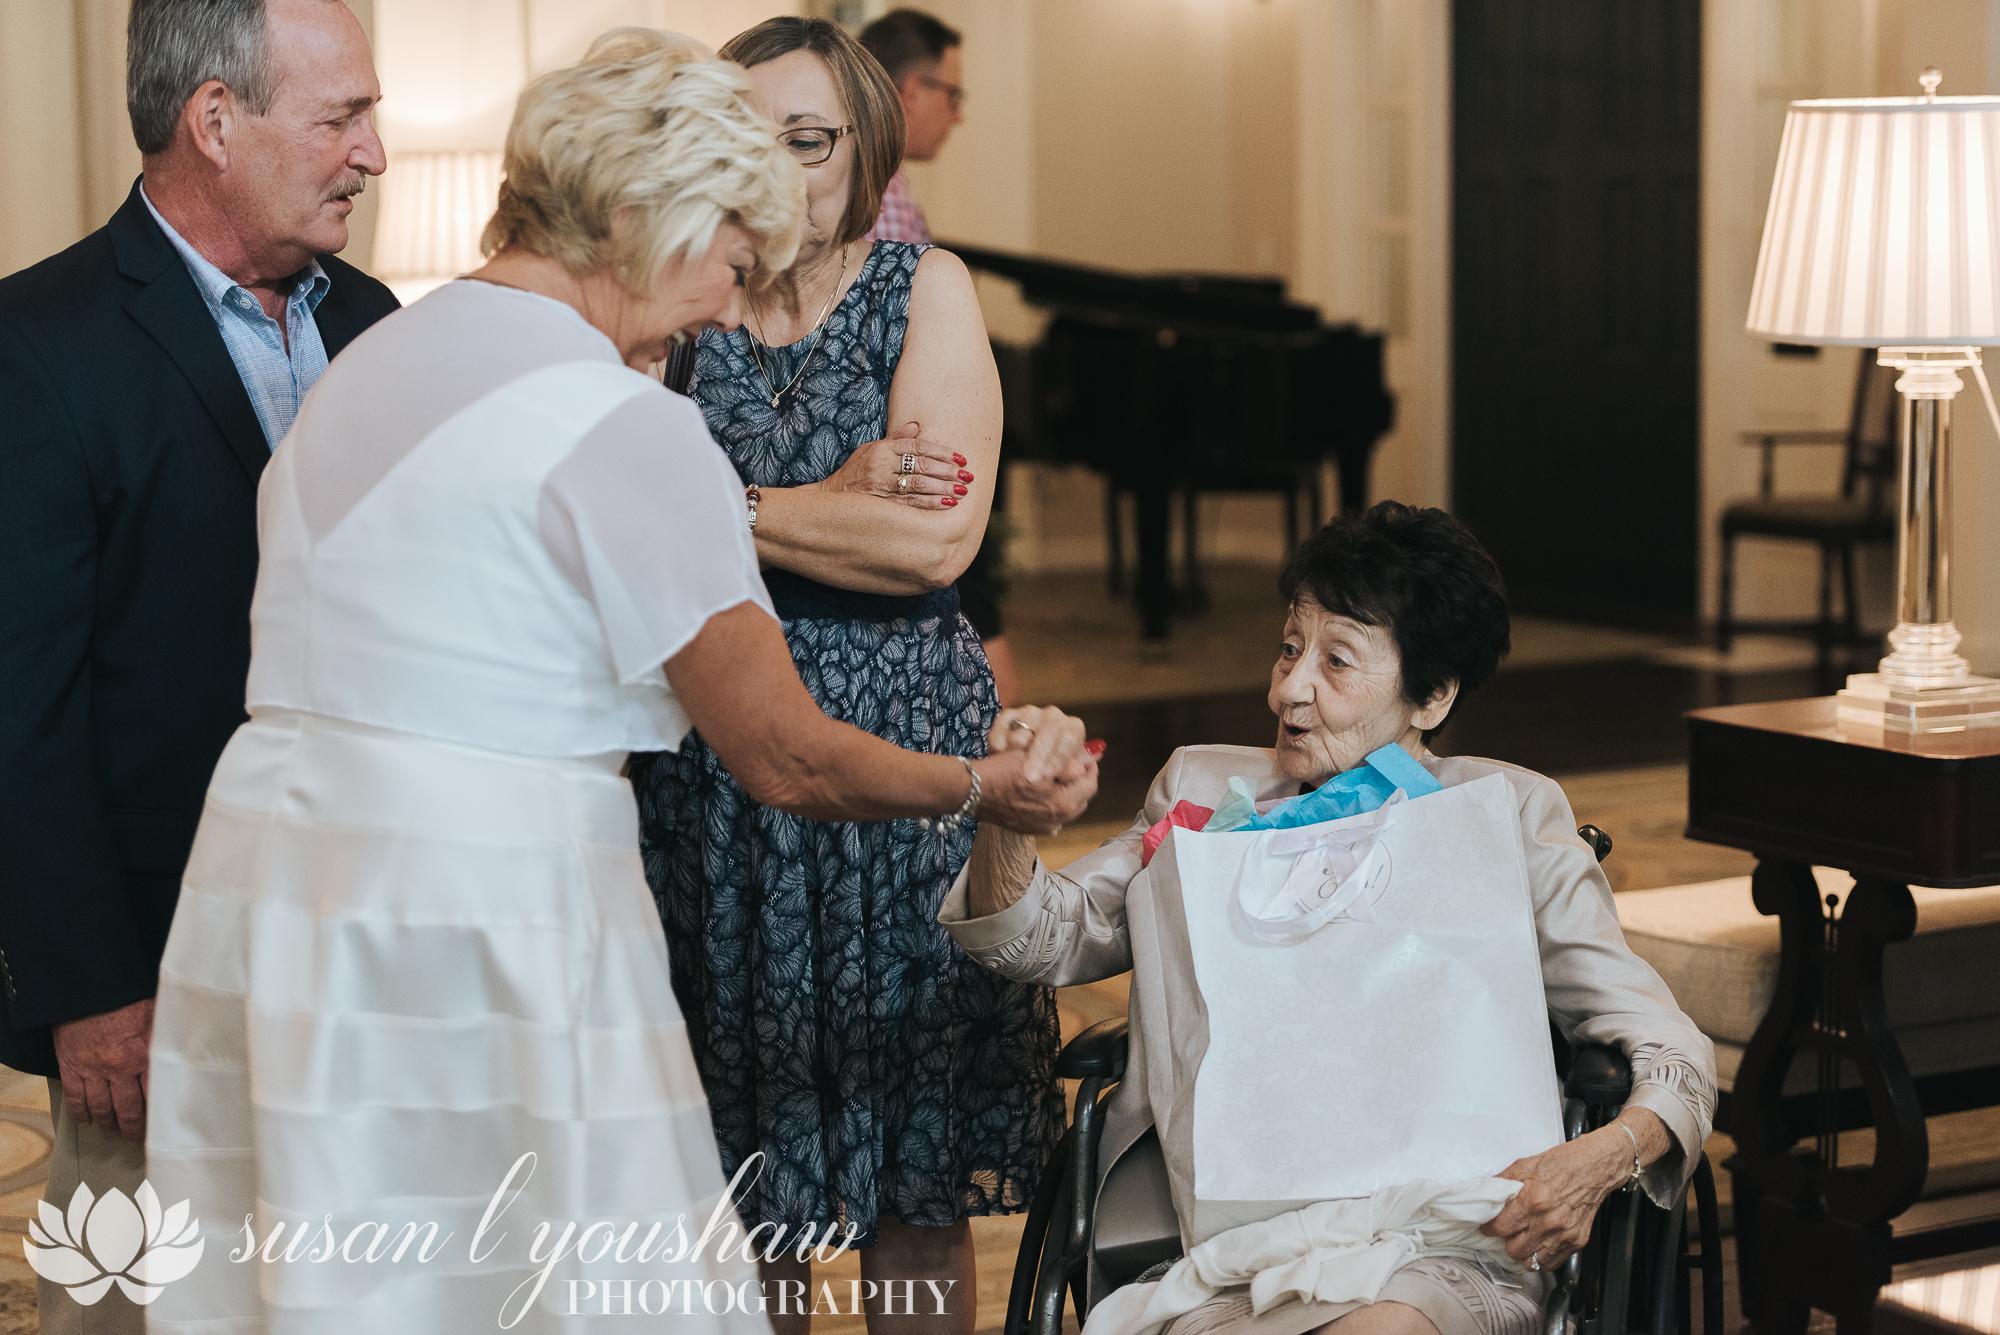 BLOG Carolyn Adams and Jim McCune 07-04-2018 SLY Photography-48.jpg